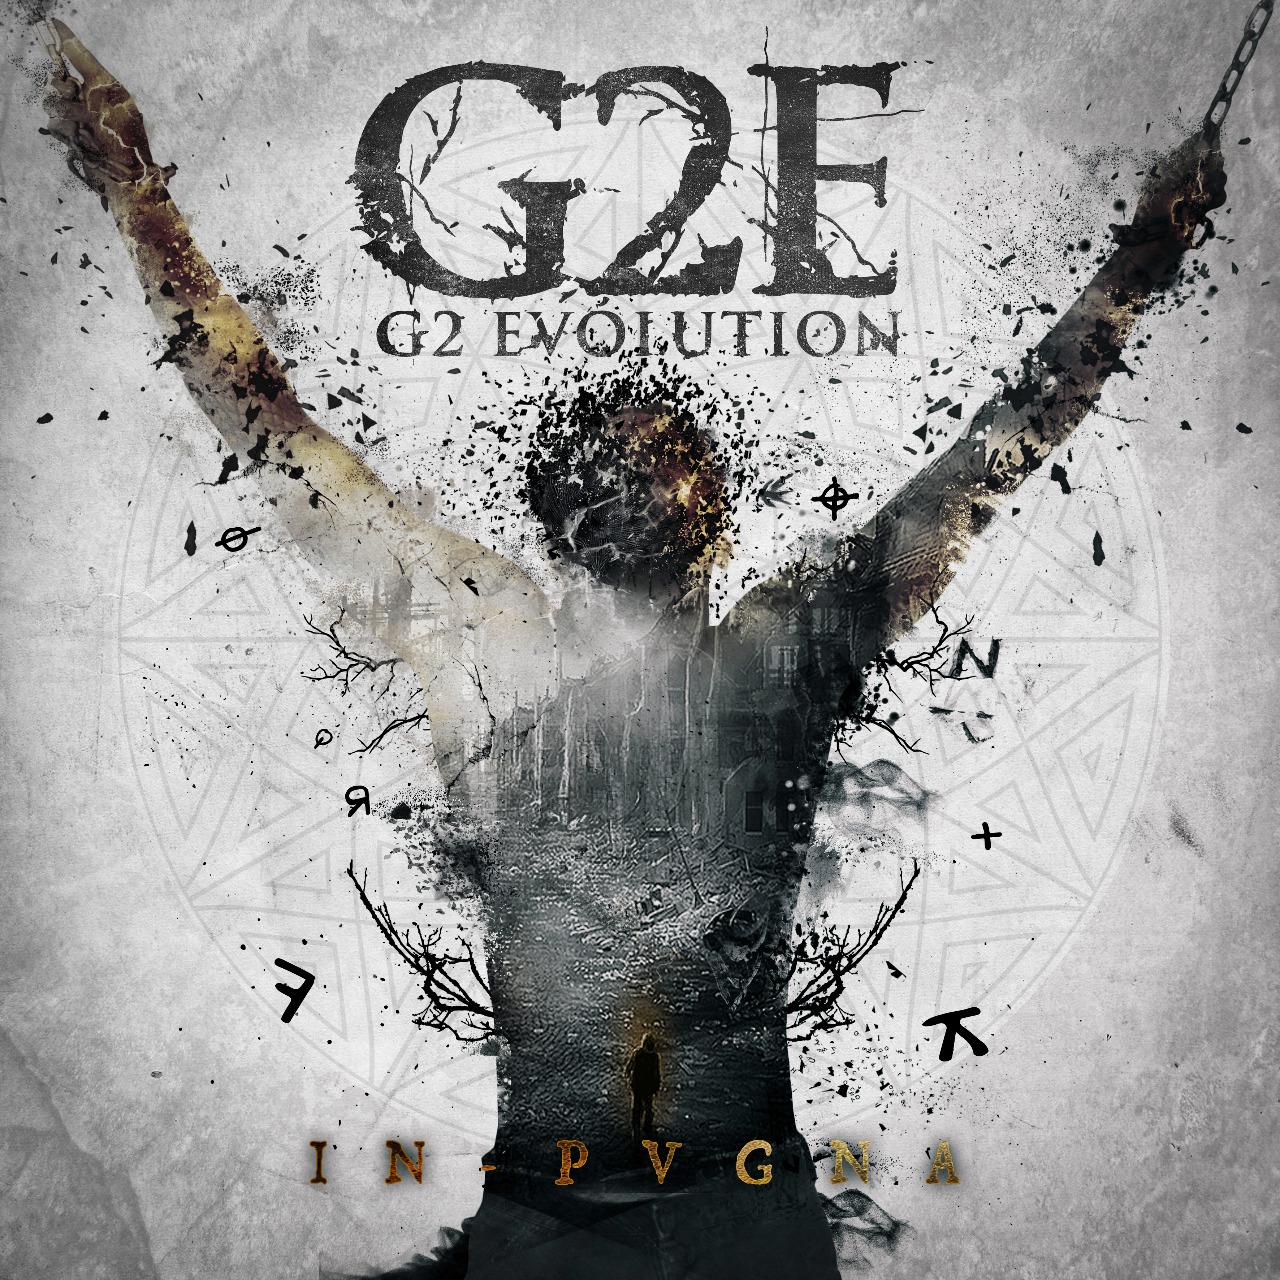 G2 Evolution